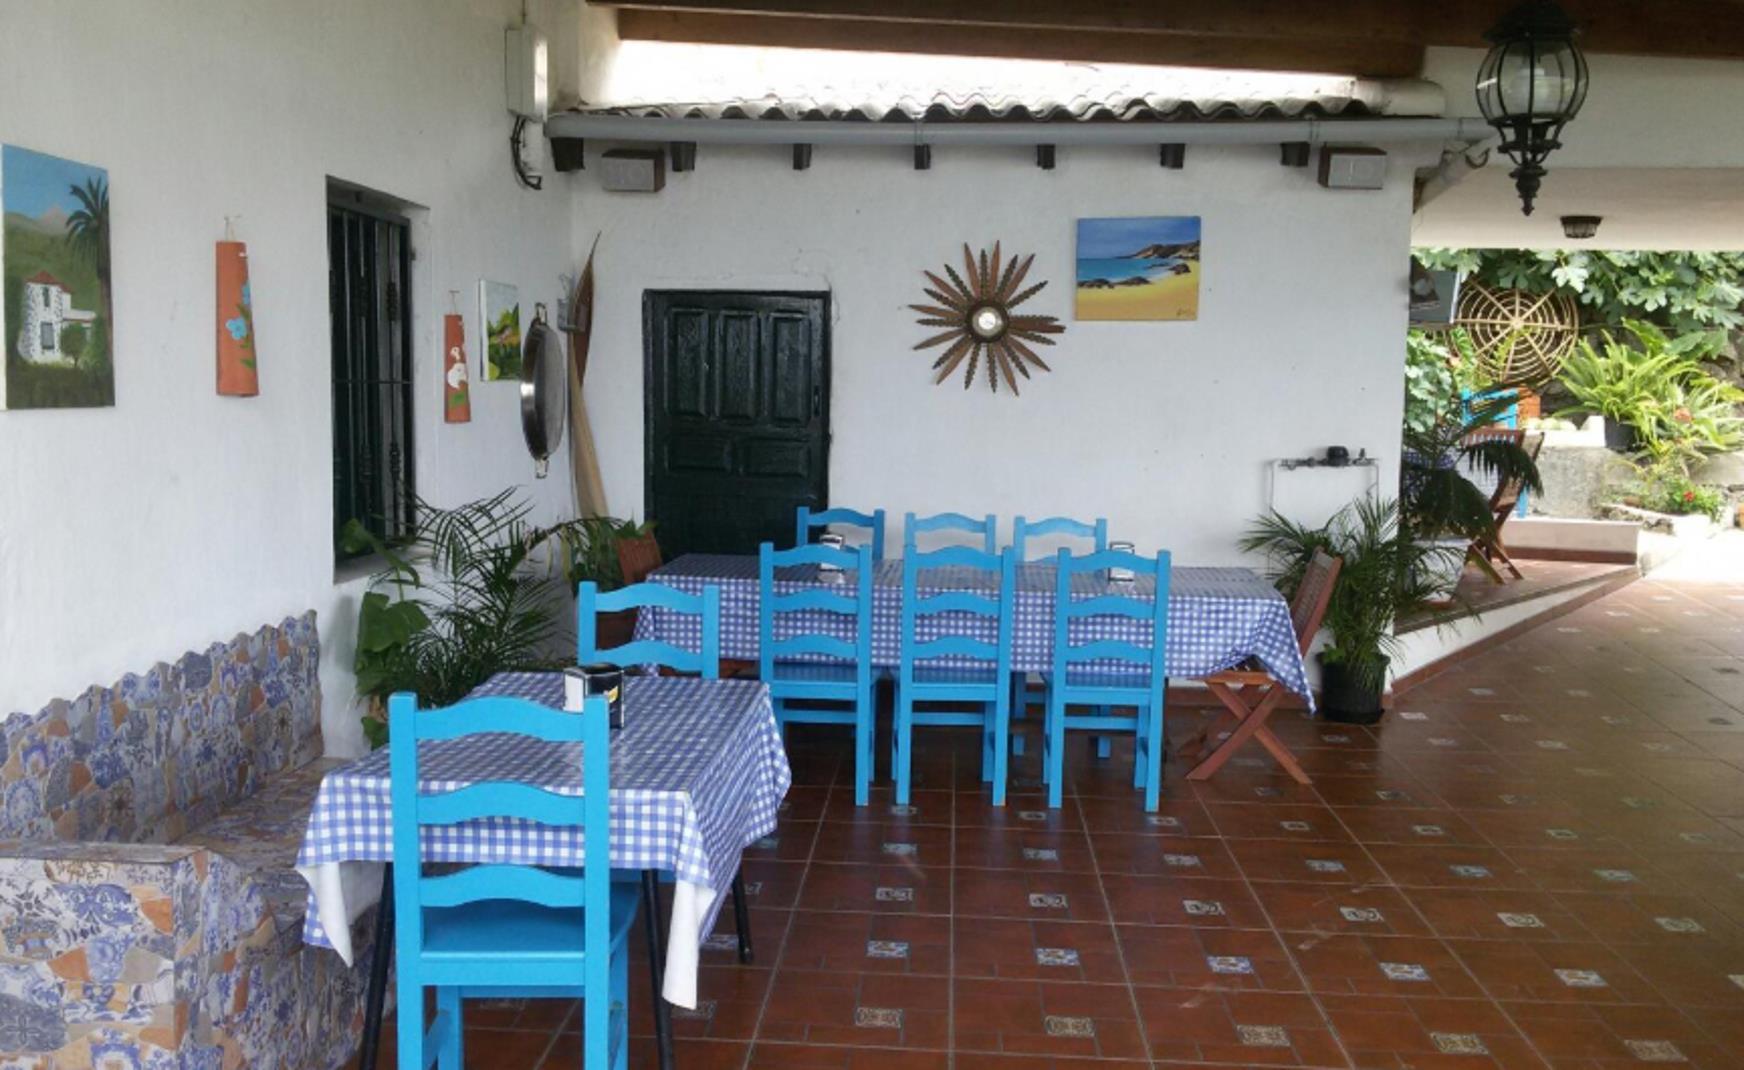 Guachinche-4-hour-Gastronomic-Tour-in-Tenerife-3